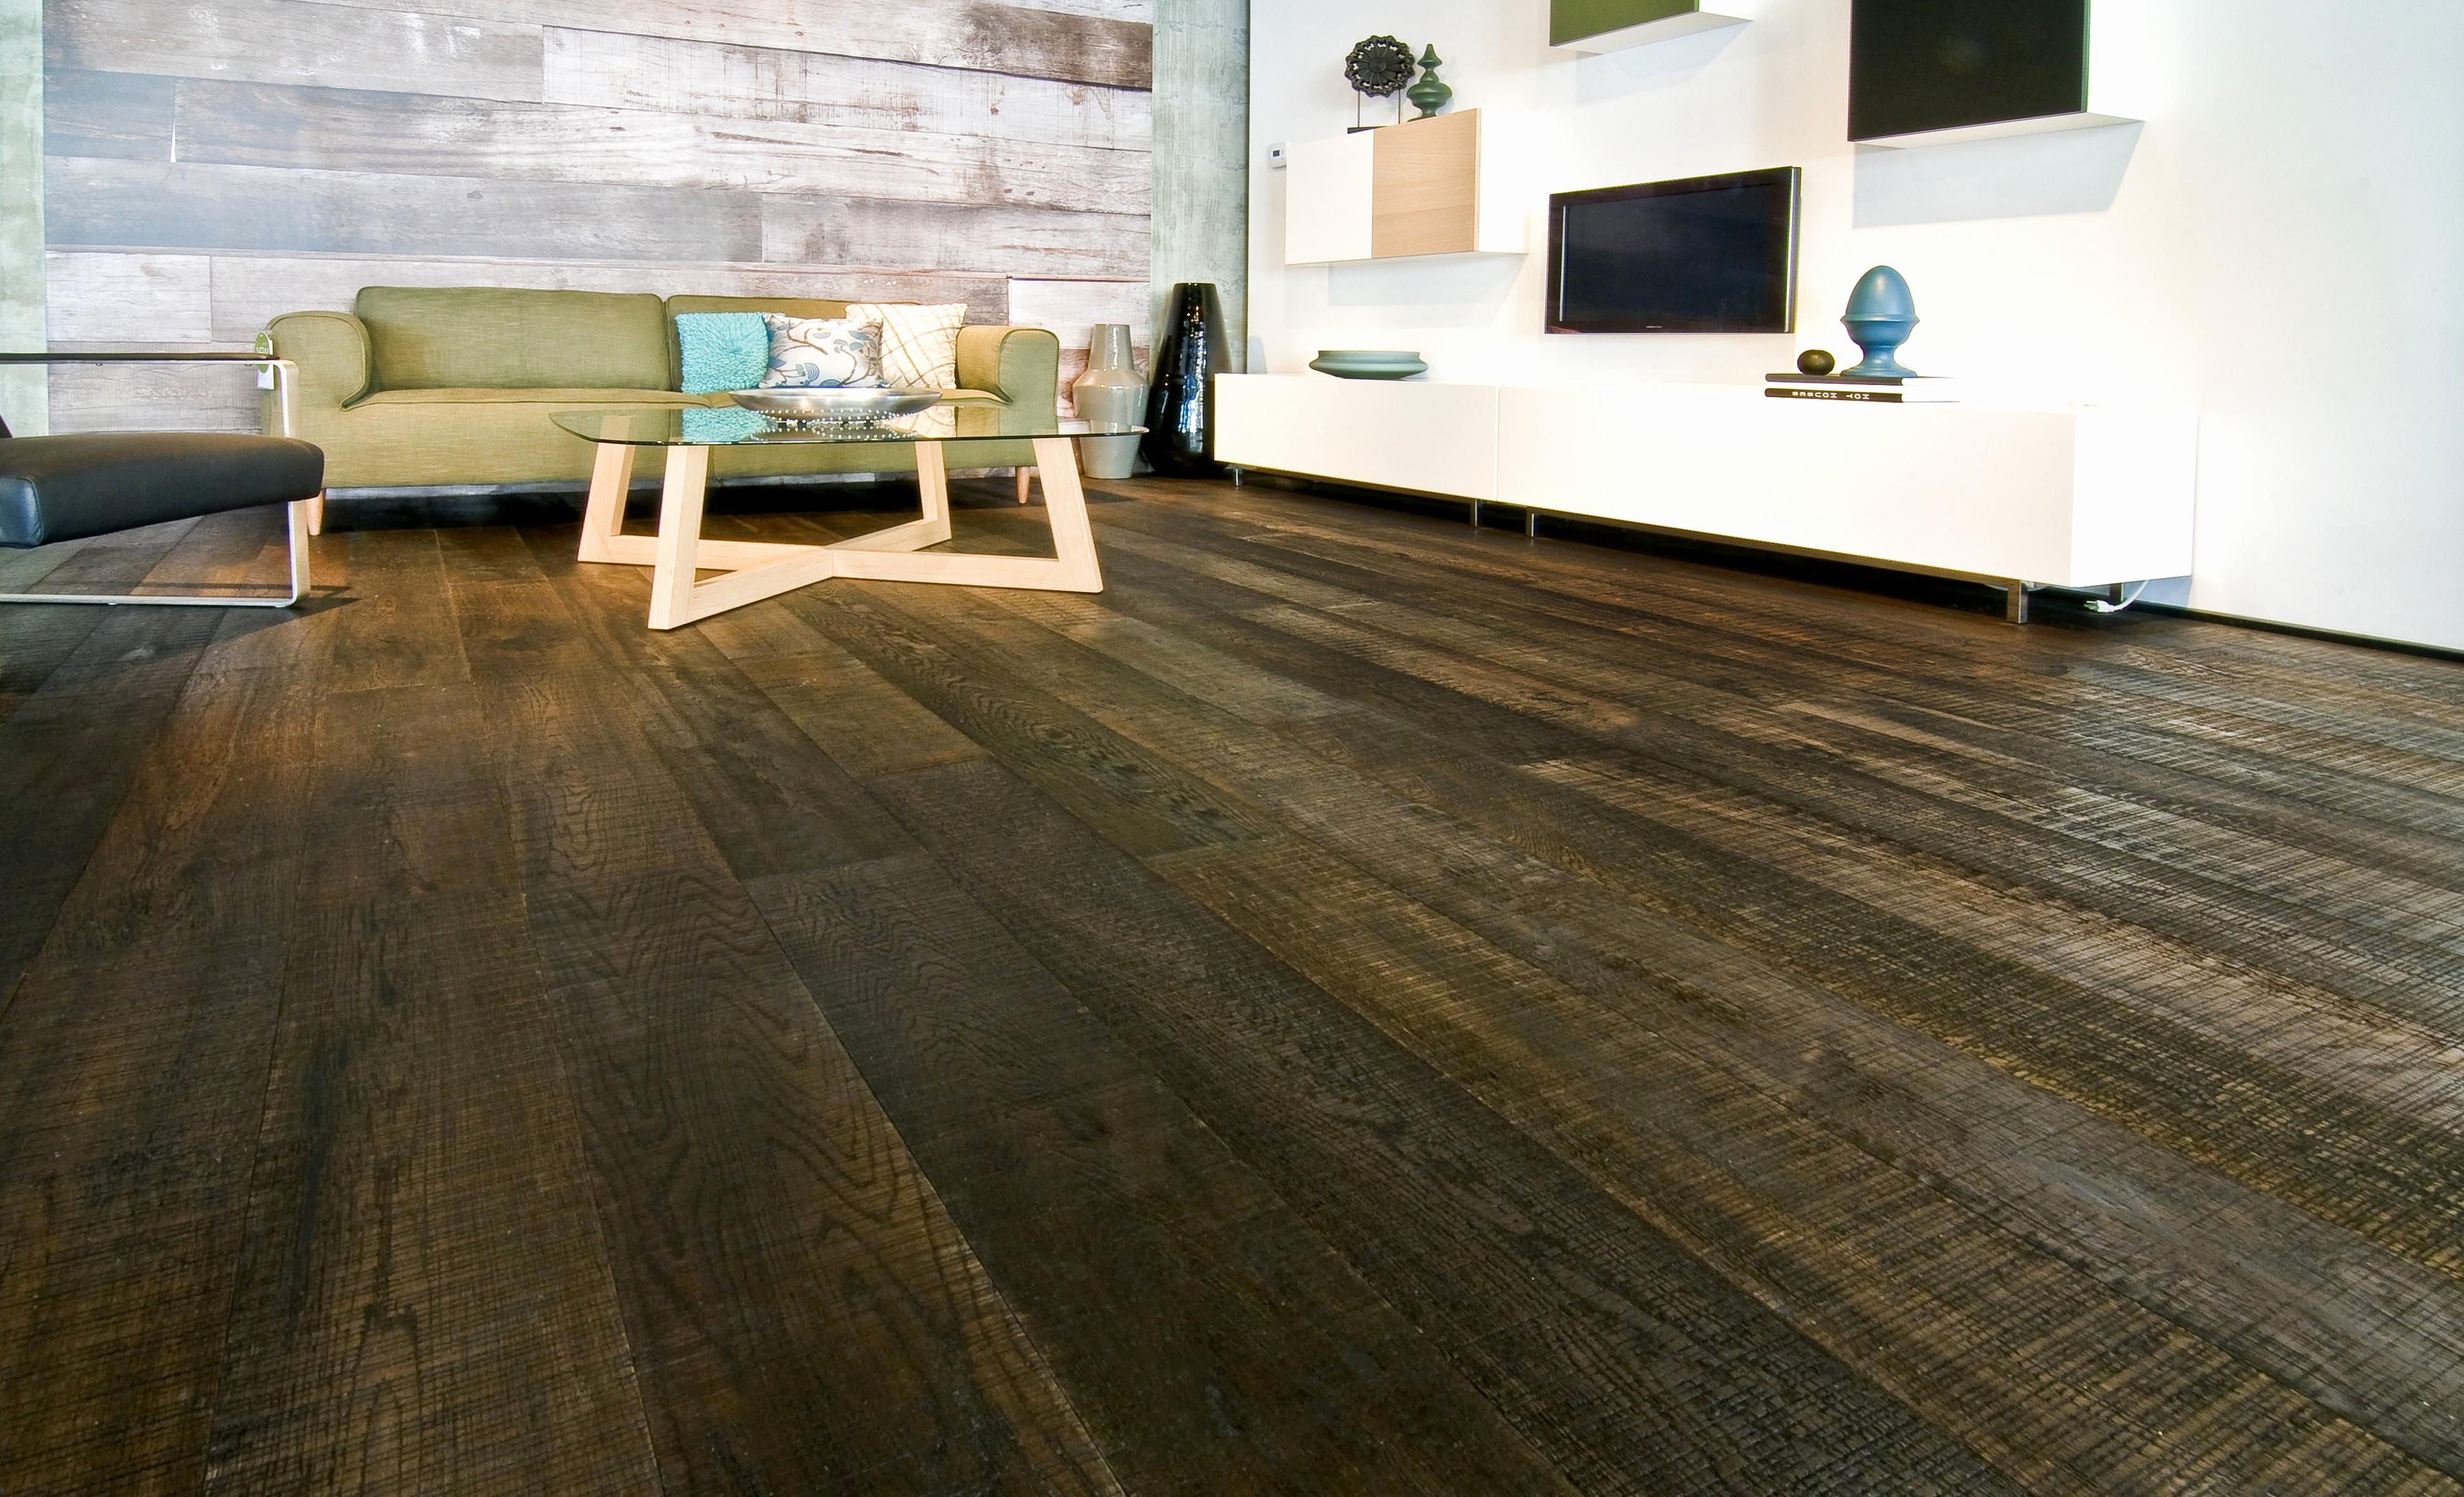 mirage red oak hardwood flooring of hardwood floor refinishing tampa awesome new gray stained maple in hardwood